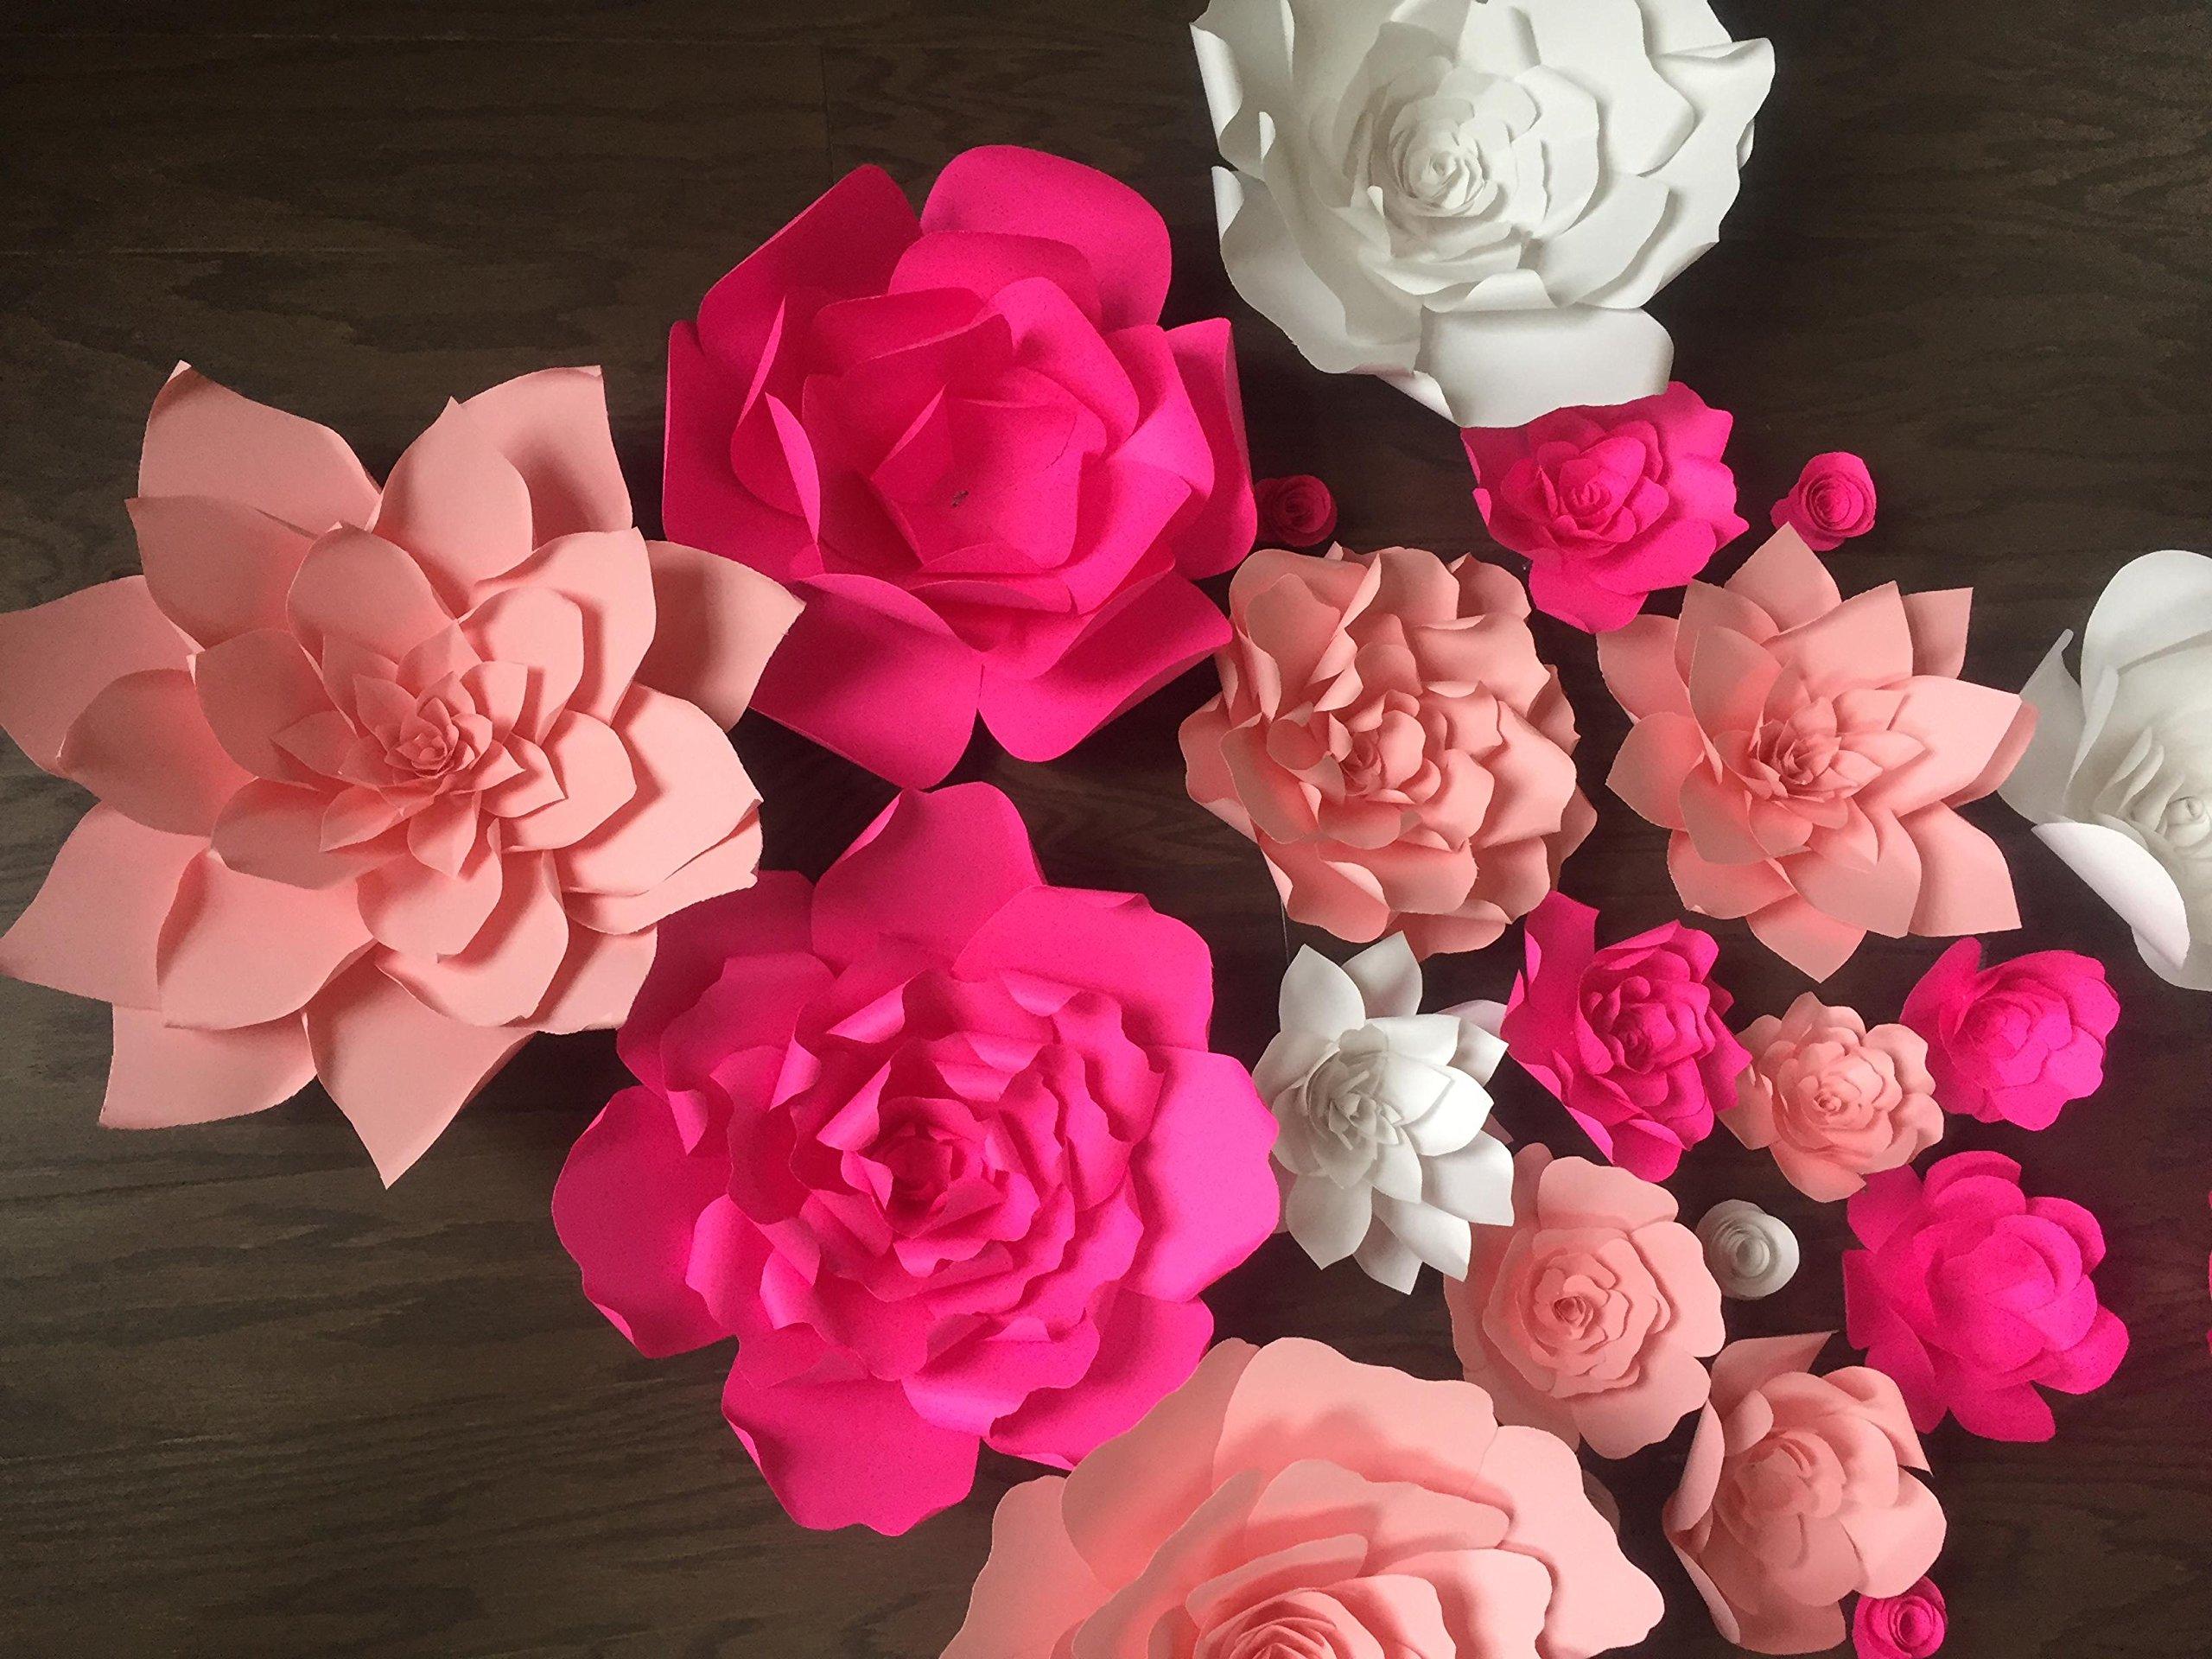 Set of 10 Mix of Giant Paper flower backdrop,window display flower backdrop,Giant paper flower wedding backdrop pink,fuchsia,white,Nursery room decor